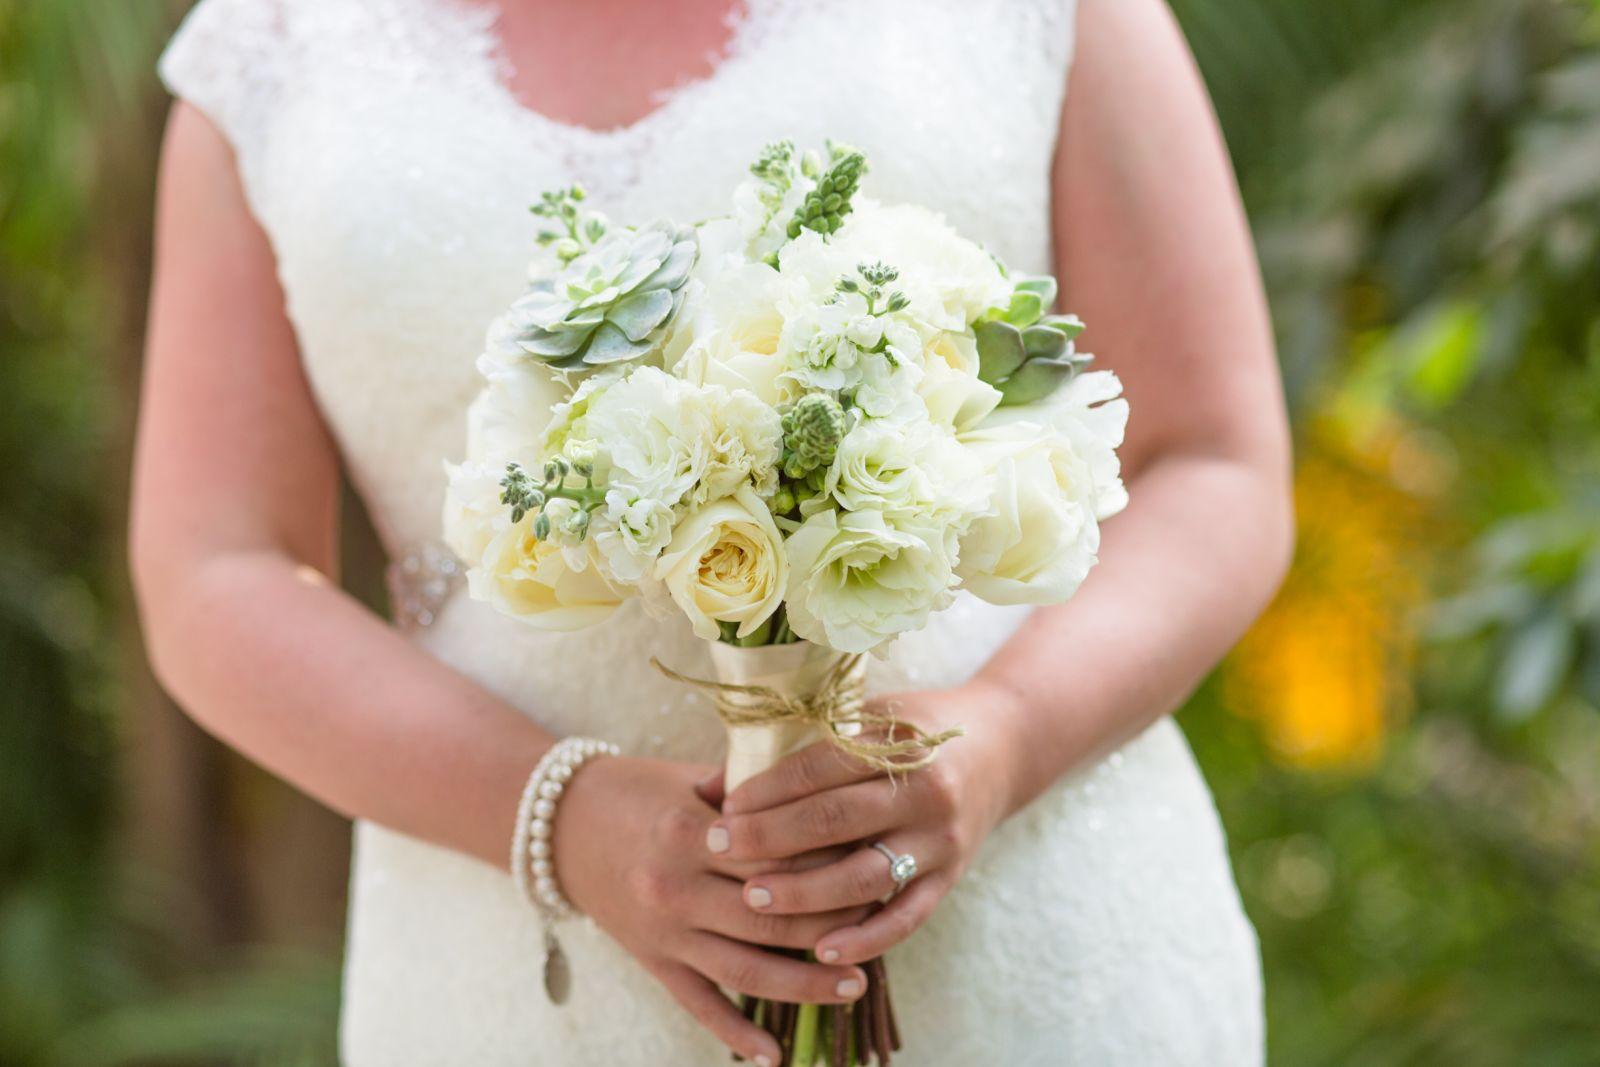 E&C romantic style for a wedding bouquet